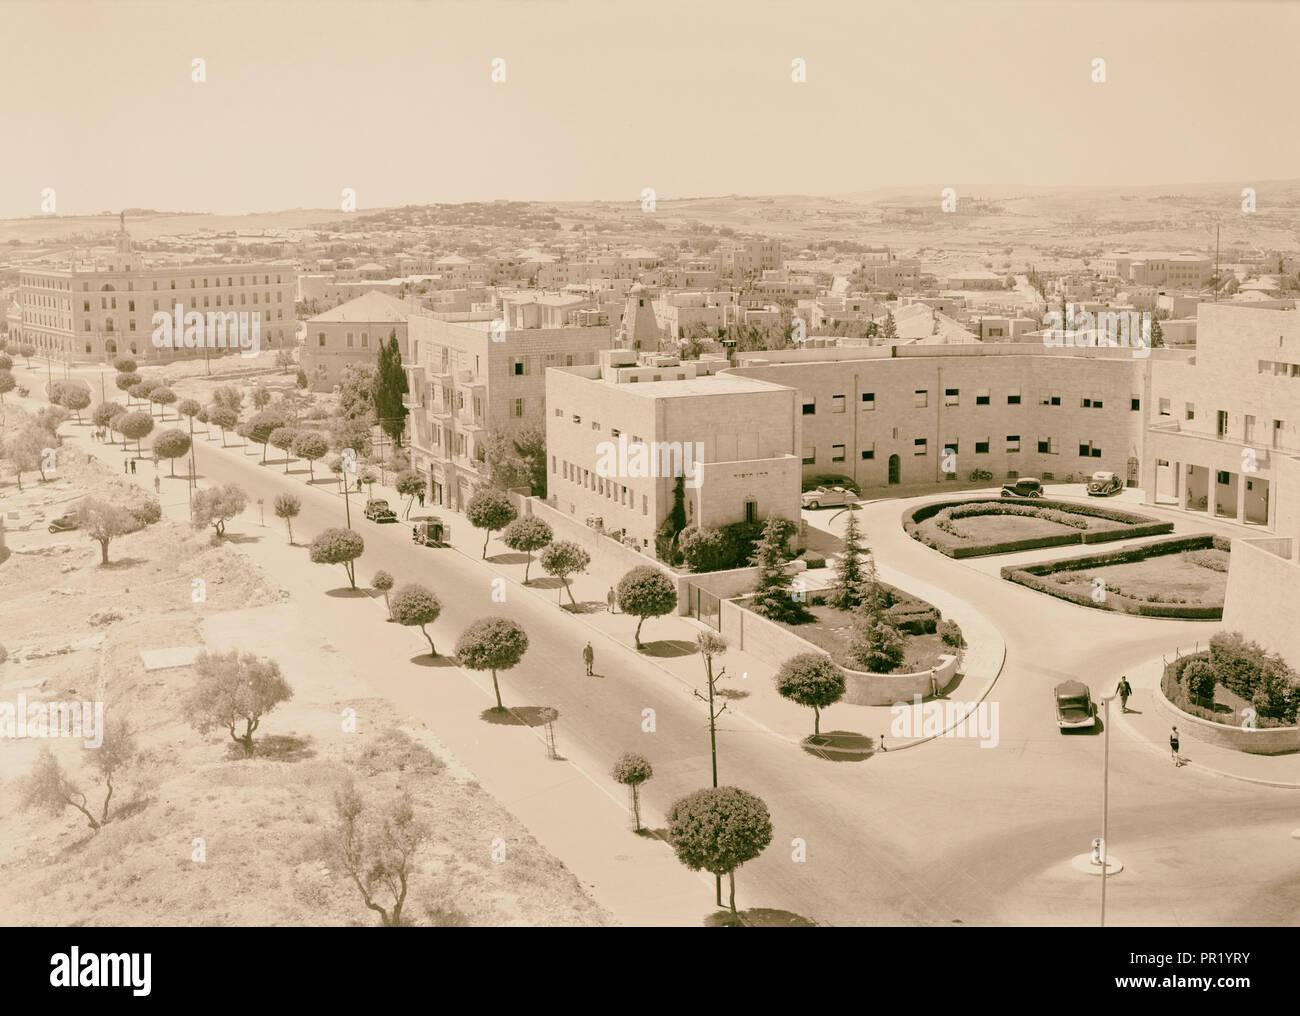 Zionist executive & King George Ave. 1942, Jerusalem, Israel - Stock Image